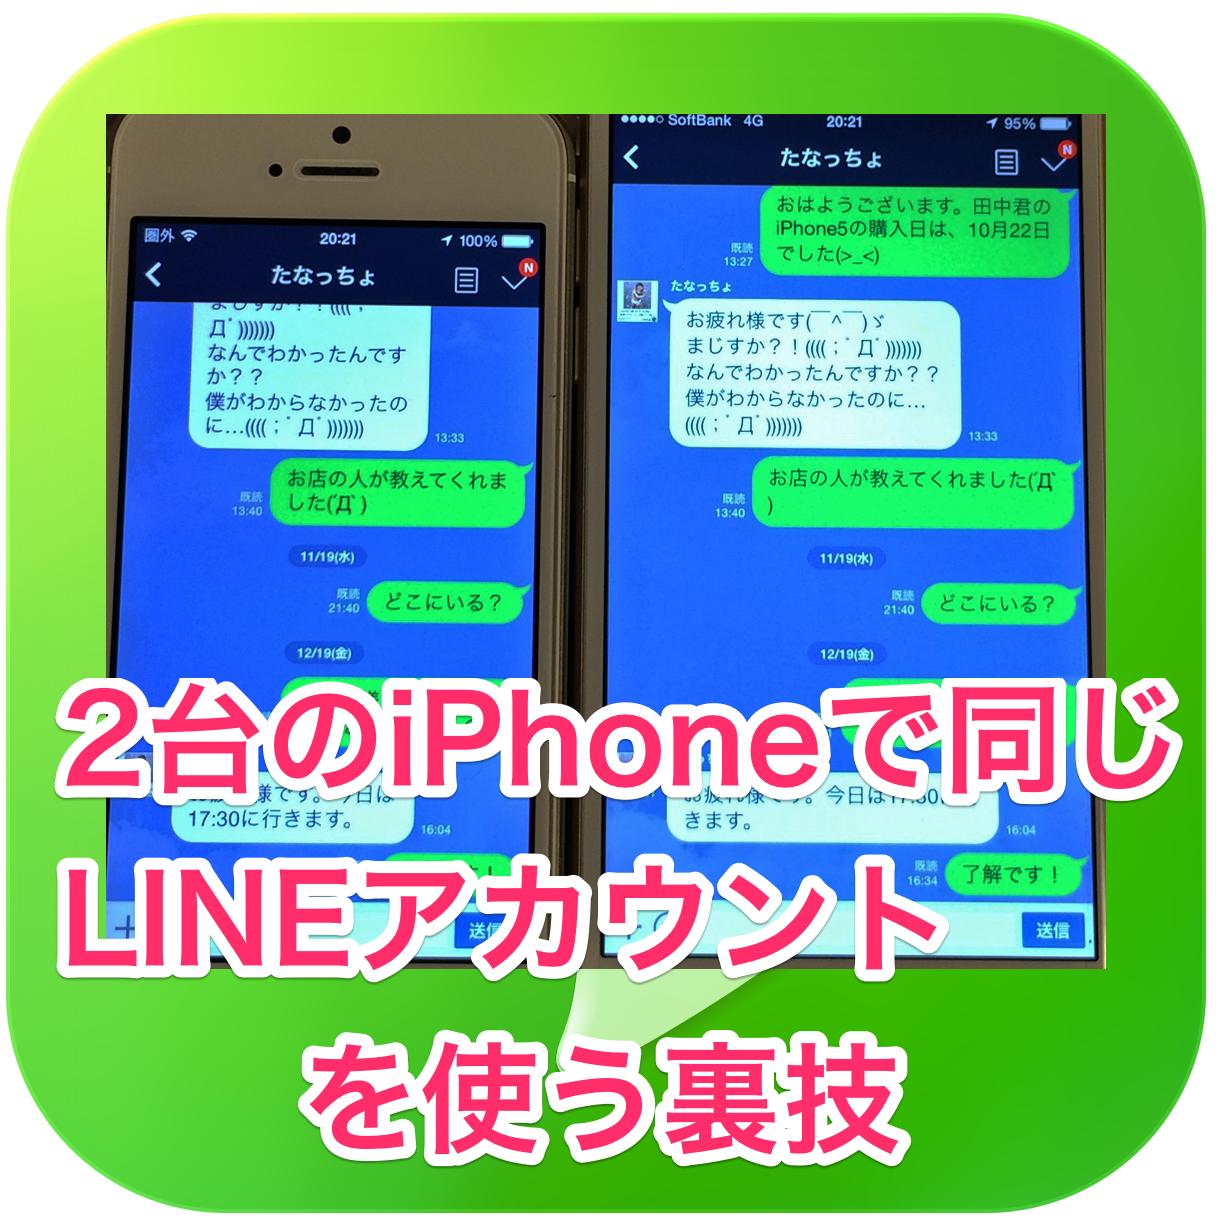 line2アカウント